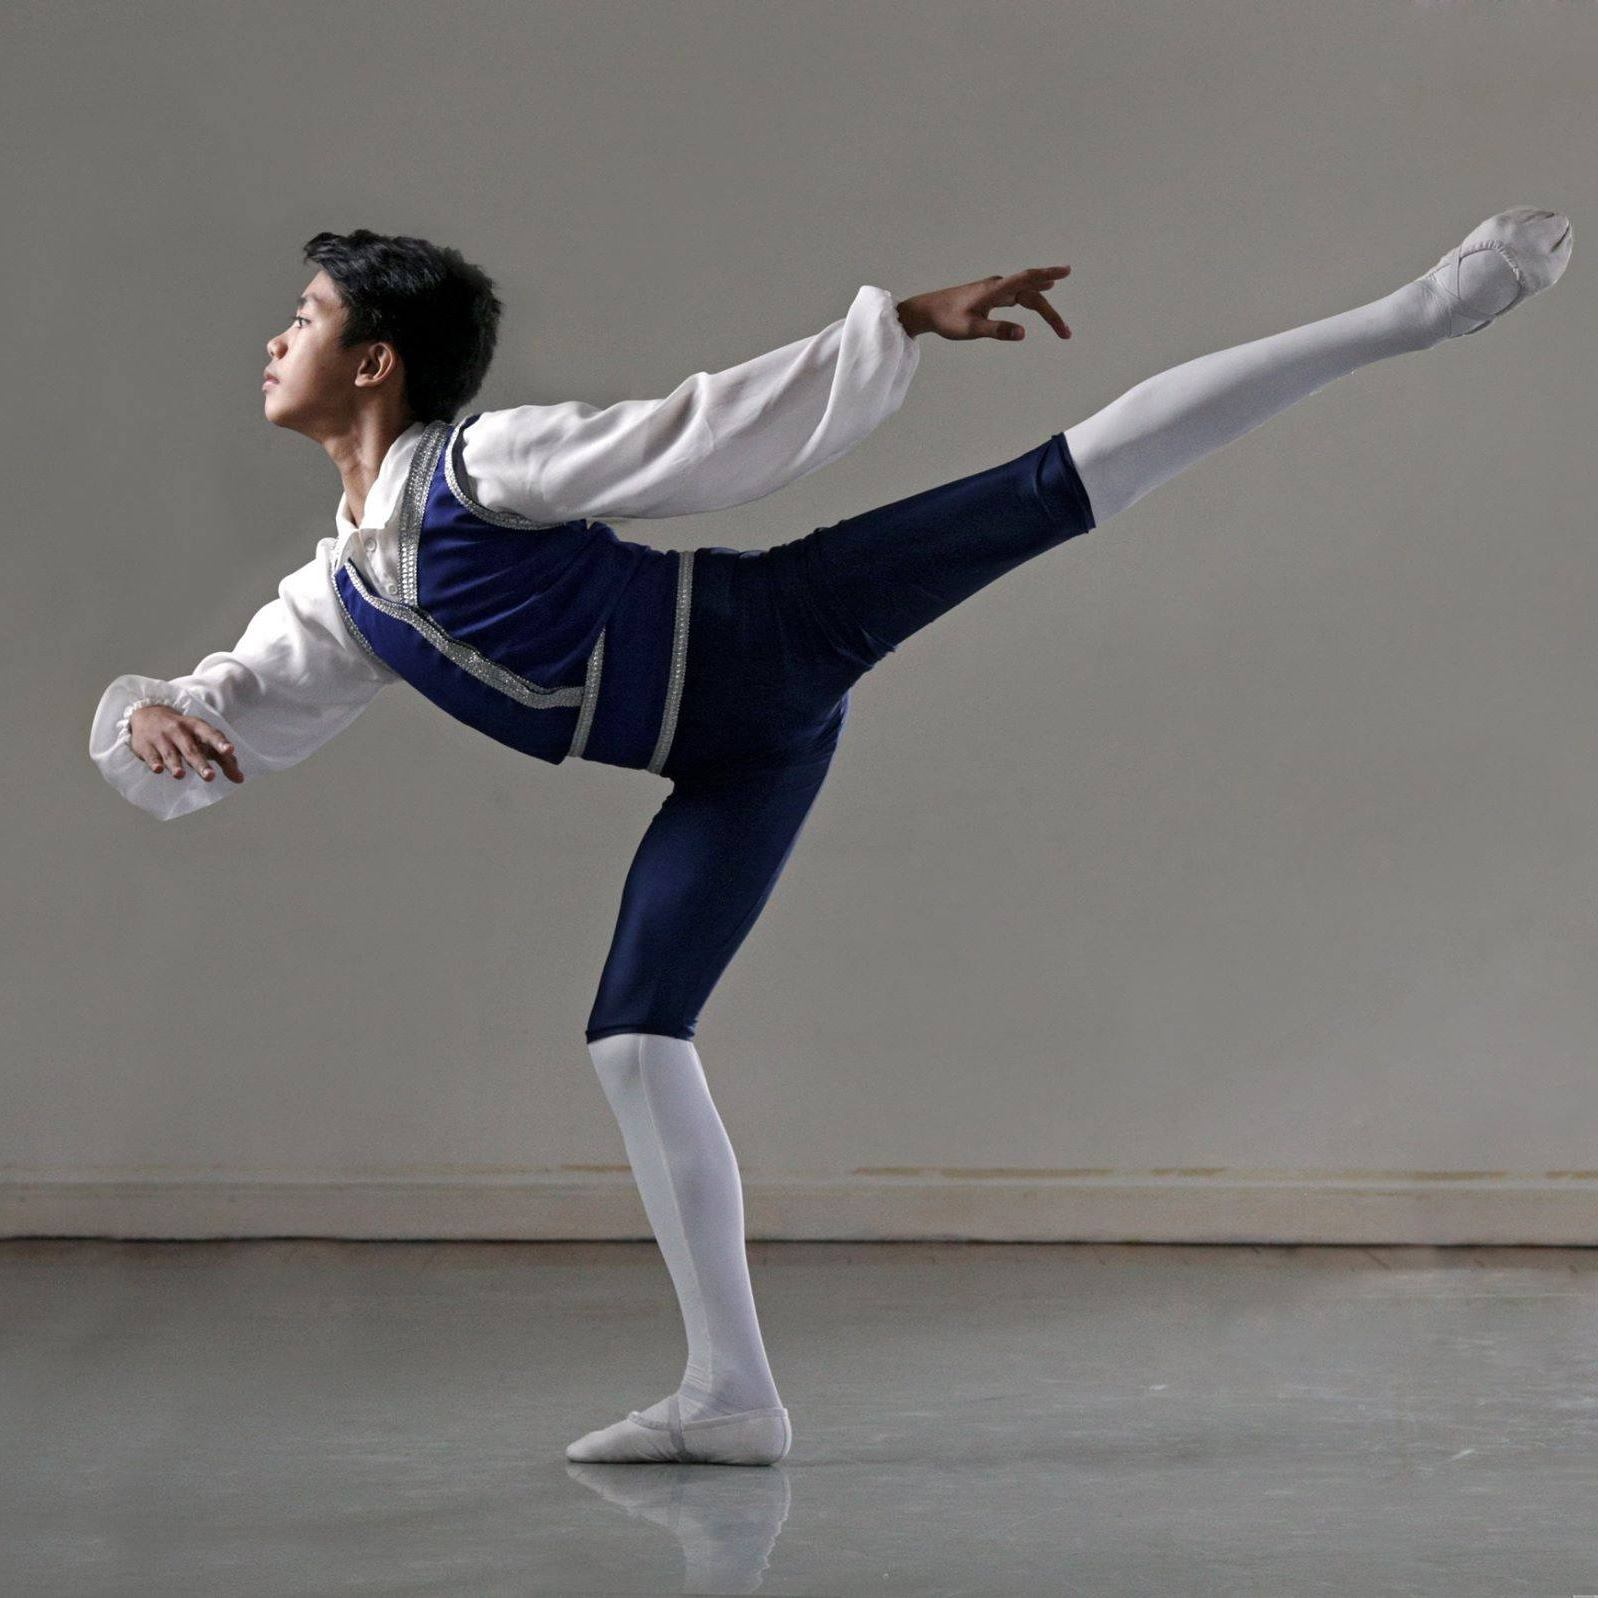 Tuloy Foundation scholar John Edmar Sumera will be dancing with Leipzig Opera Ballet. Photo by Ernest Mandap